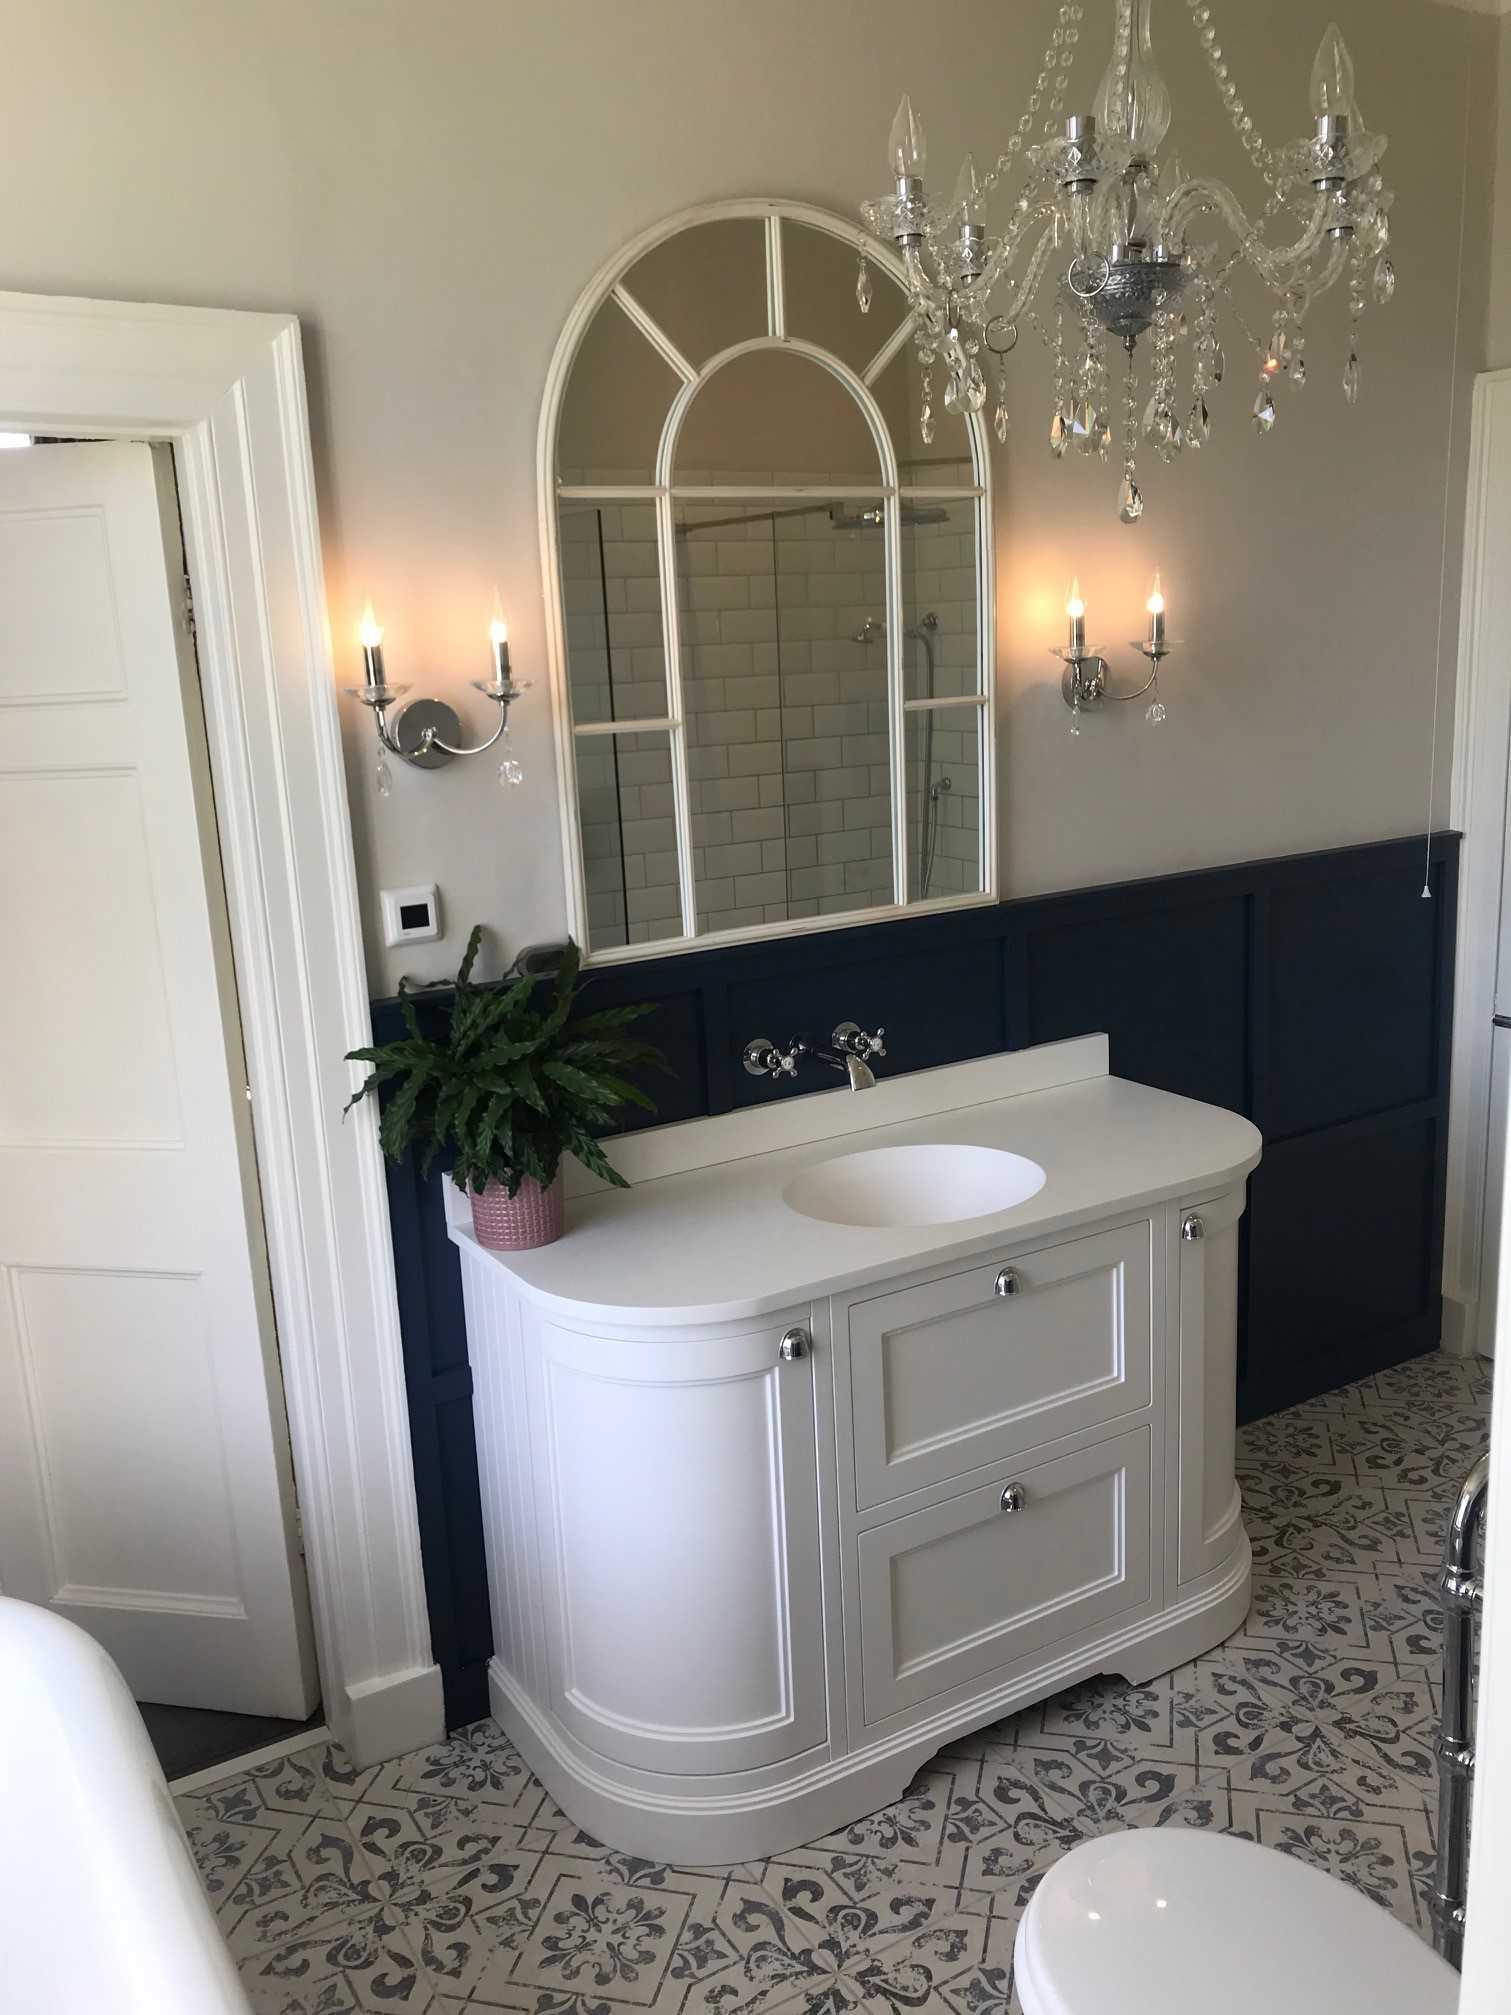 Plumbing-Solutions-Plus Bathroom-Installation Brent-knoll